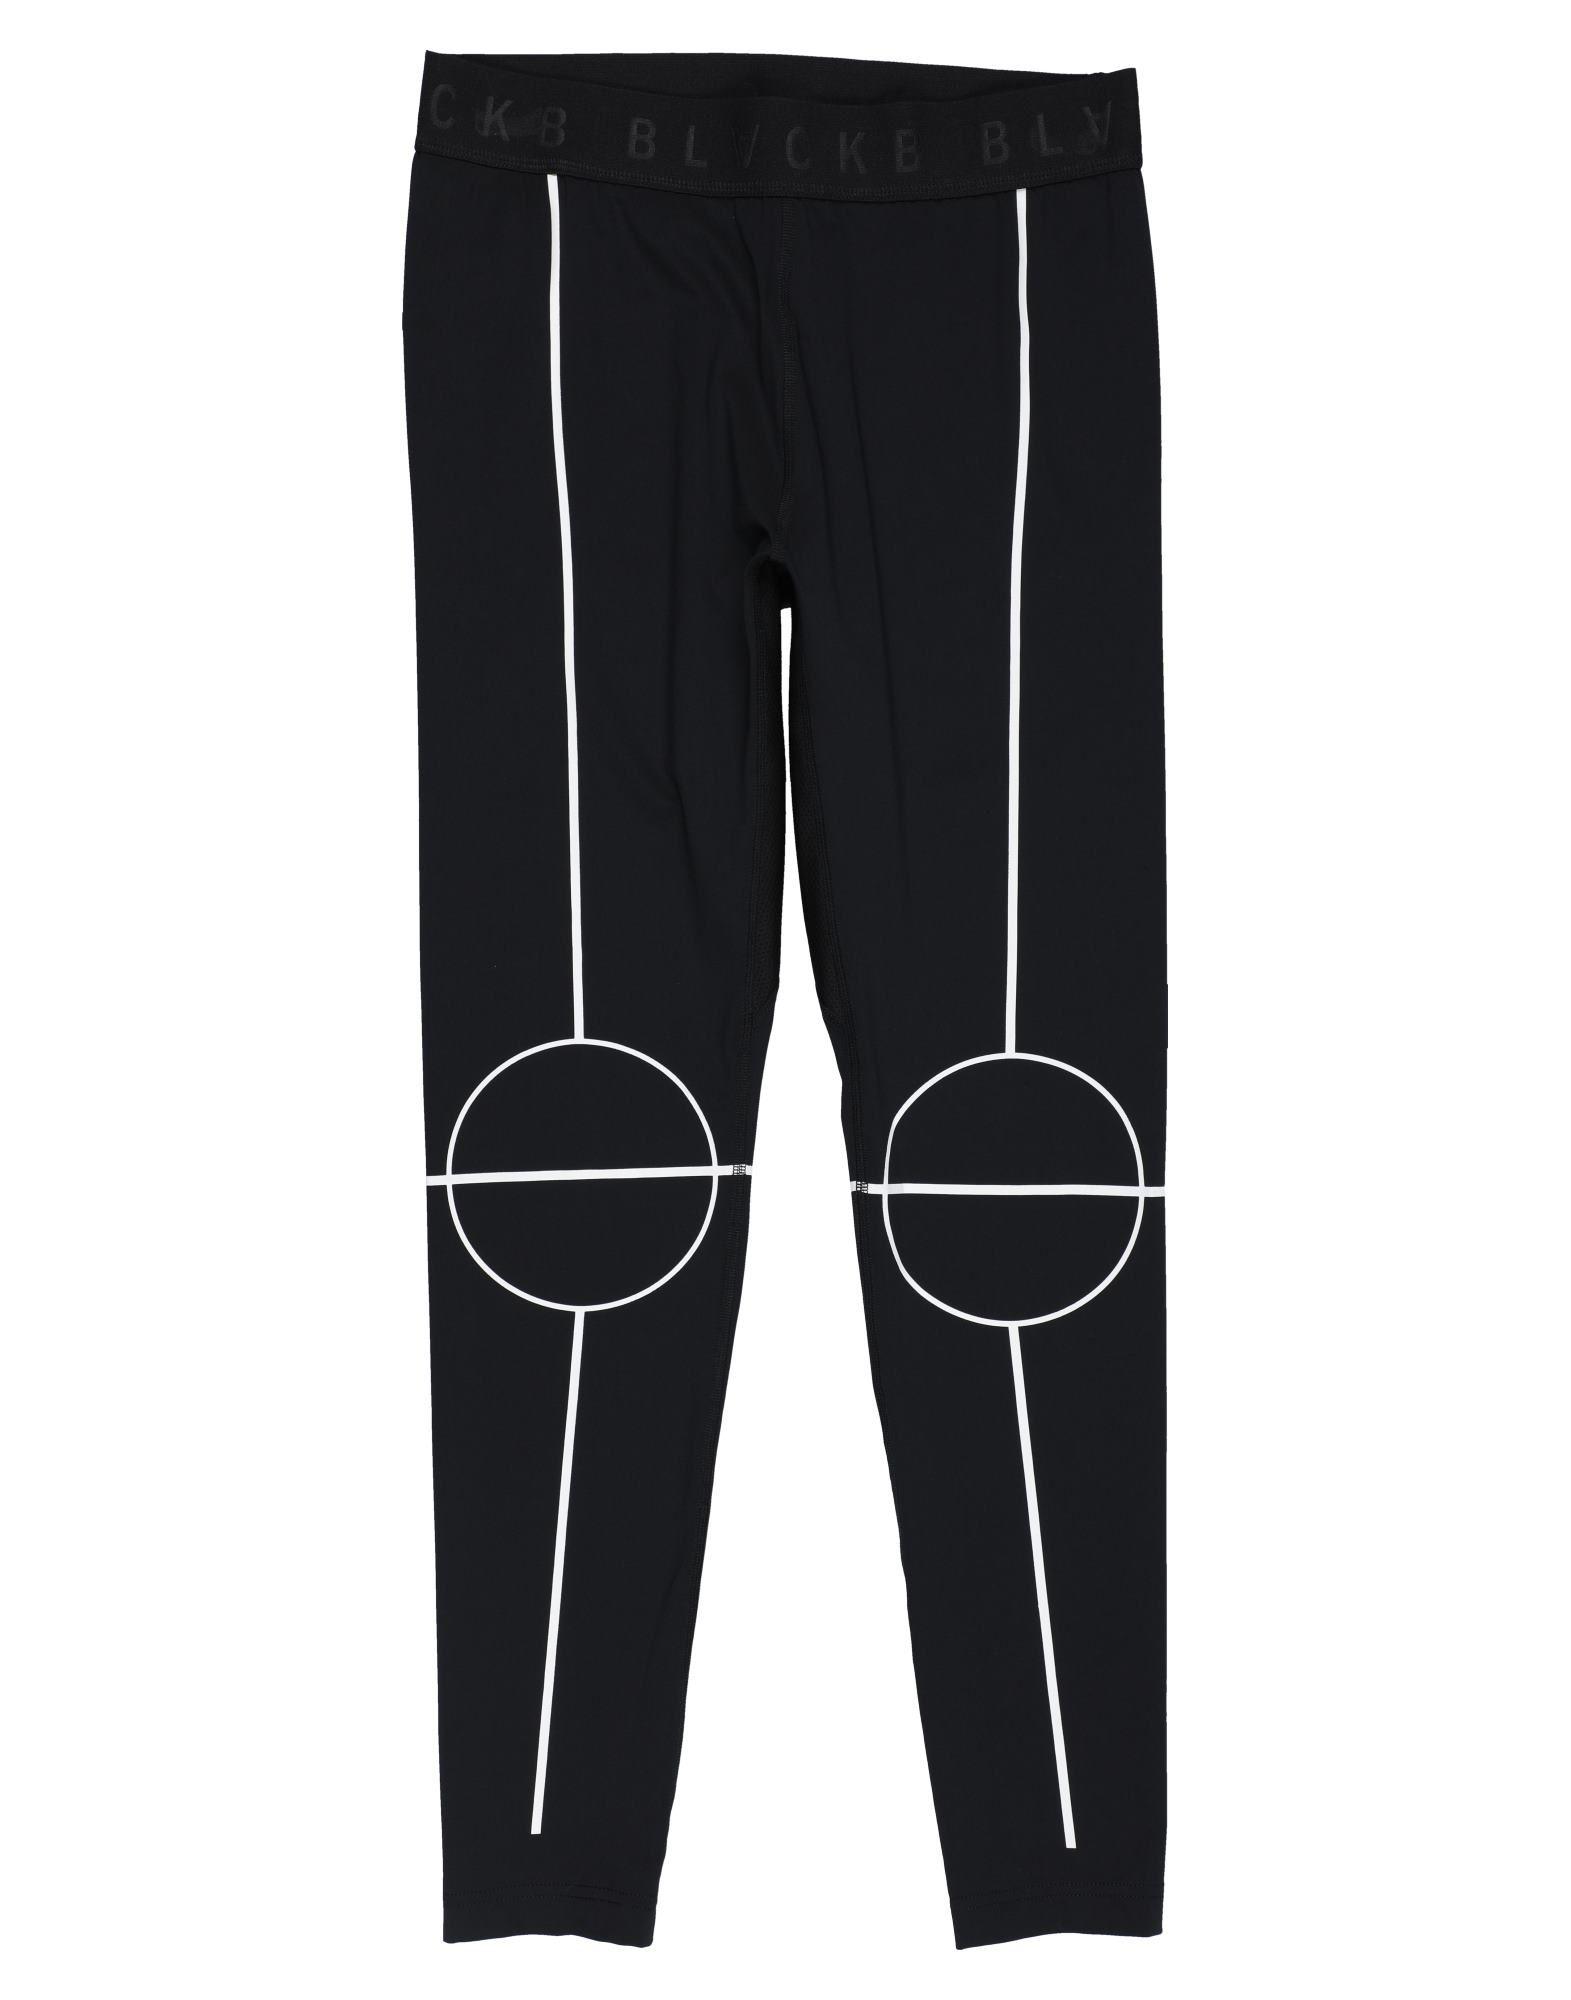 NEIL BARRETT Leggings. jersey, print, logo, two-tone, mid rise, slim fit, tapered leg, elasticized waist, no pockets, stretch. 80% Nylon, 20% Elastane, Polyester